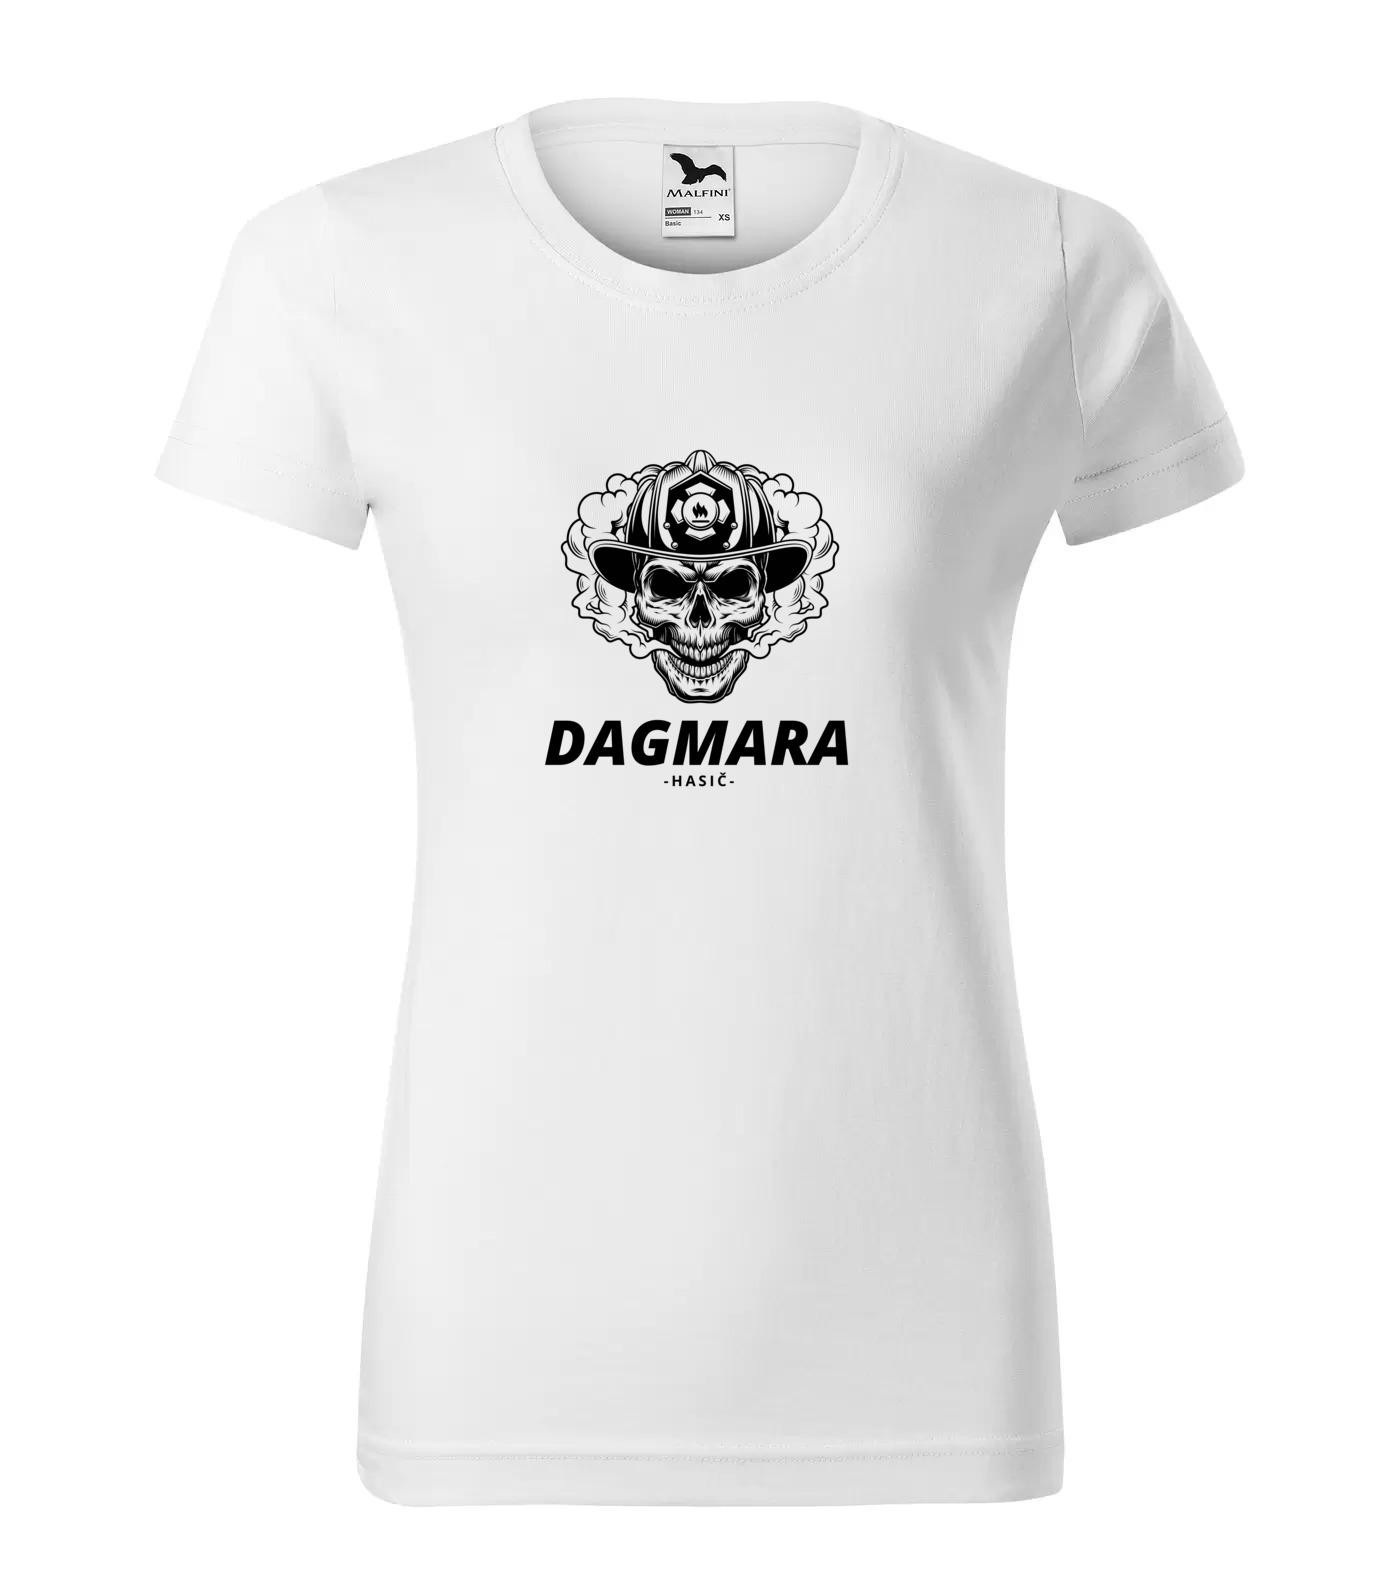 Tričko Hasič Dagmara